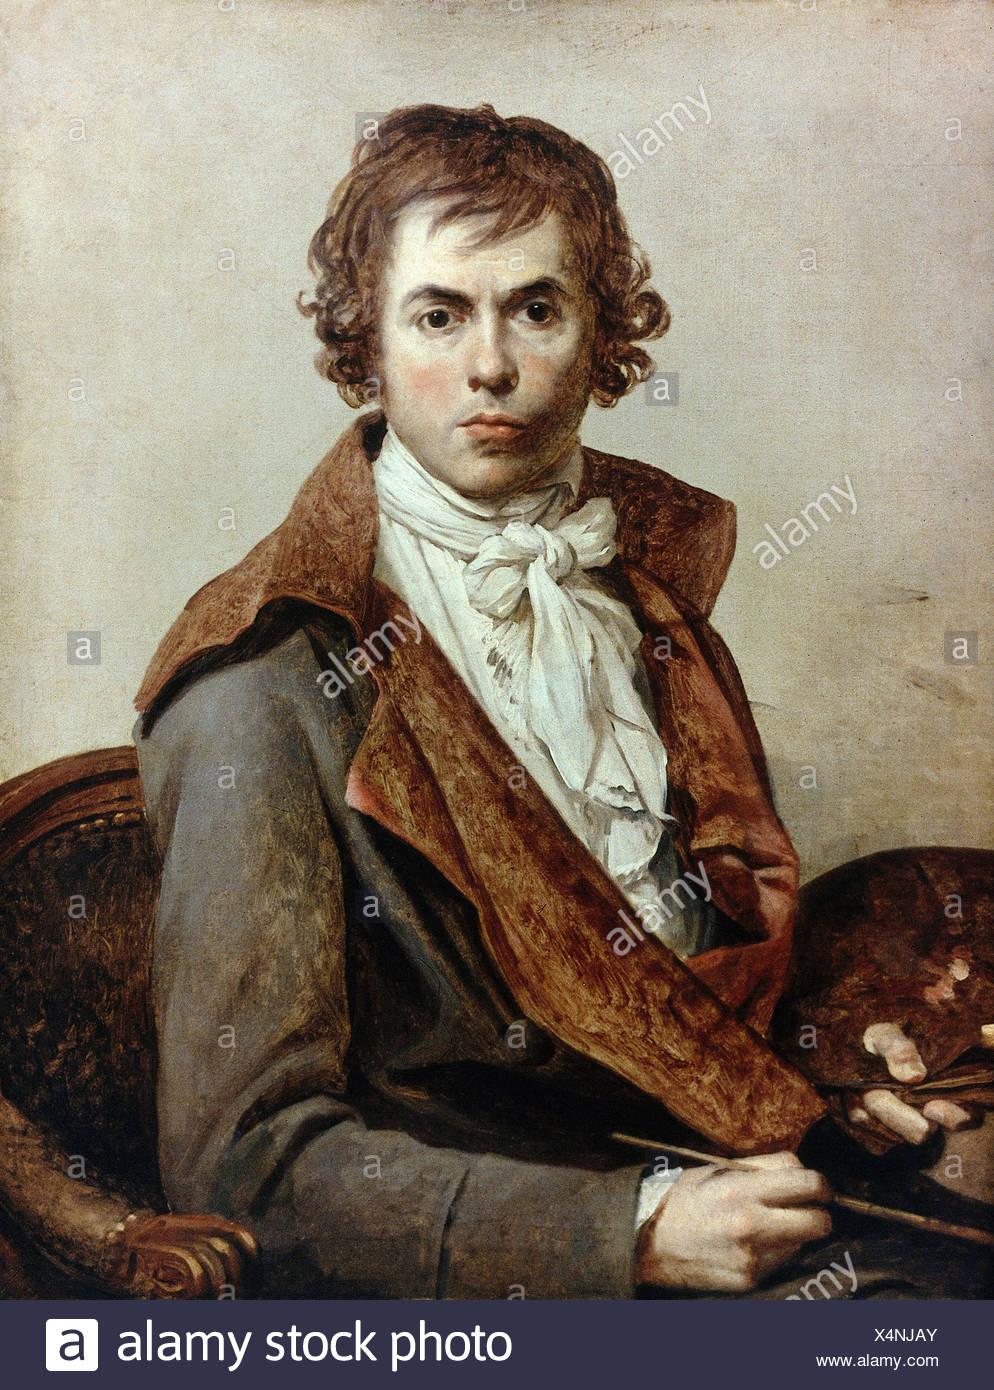 David, Jacques-Louis, 31.8.1748 - 24.12.1825, French painter, self-half  length, 81 cm x 64 cm, 1794, Louvre, Paris, Additional-Rights-Clearances-NA